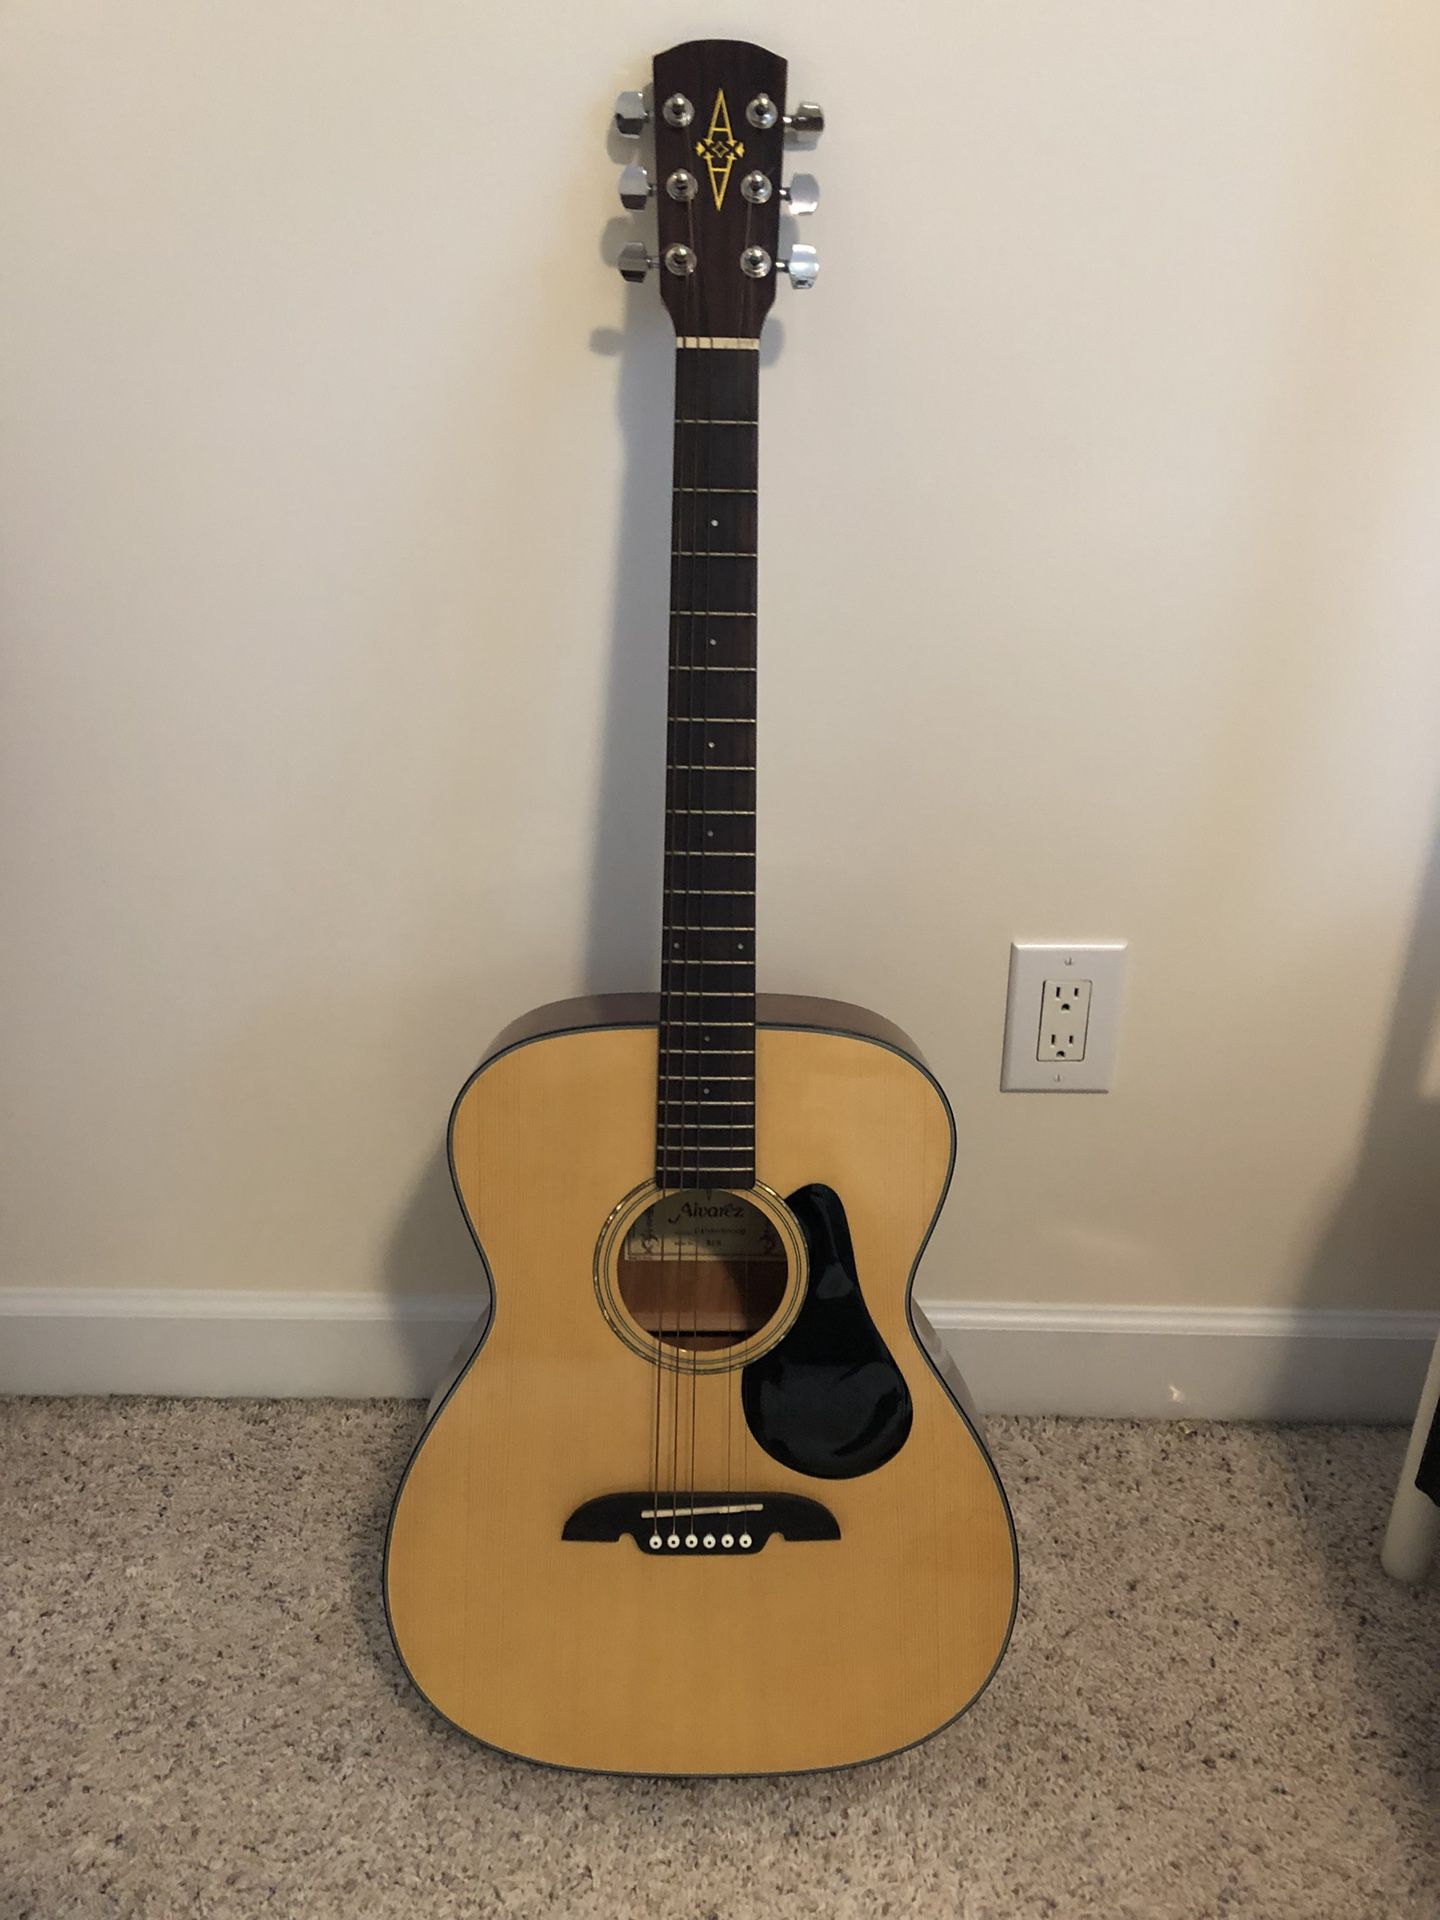 Alvarez folk guitar!!